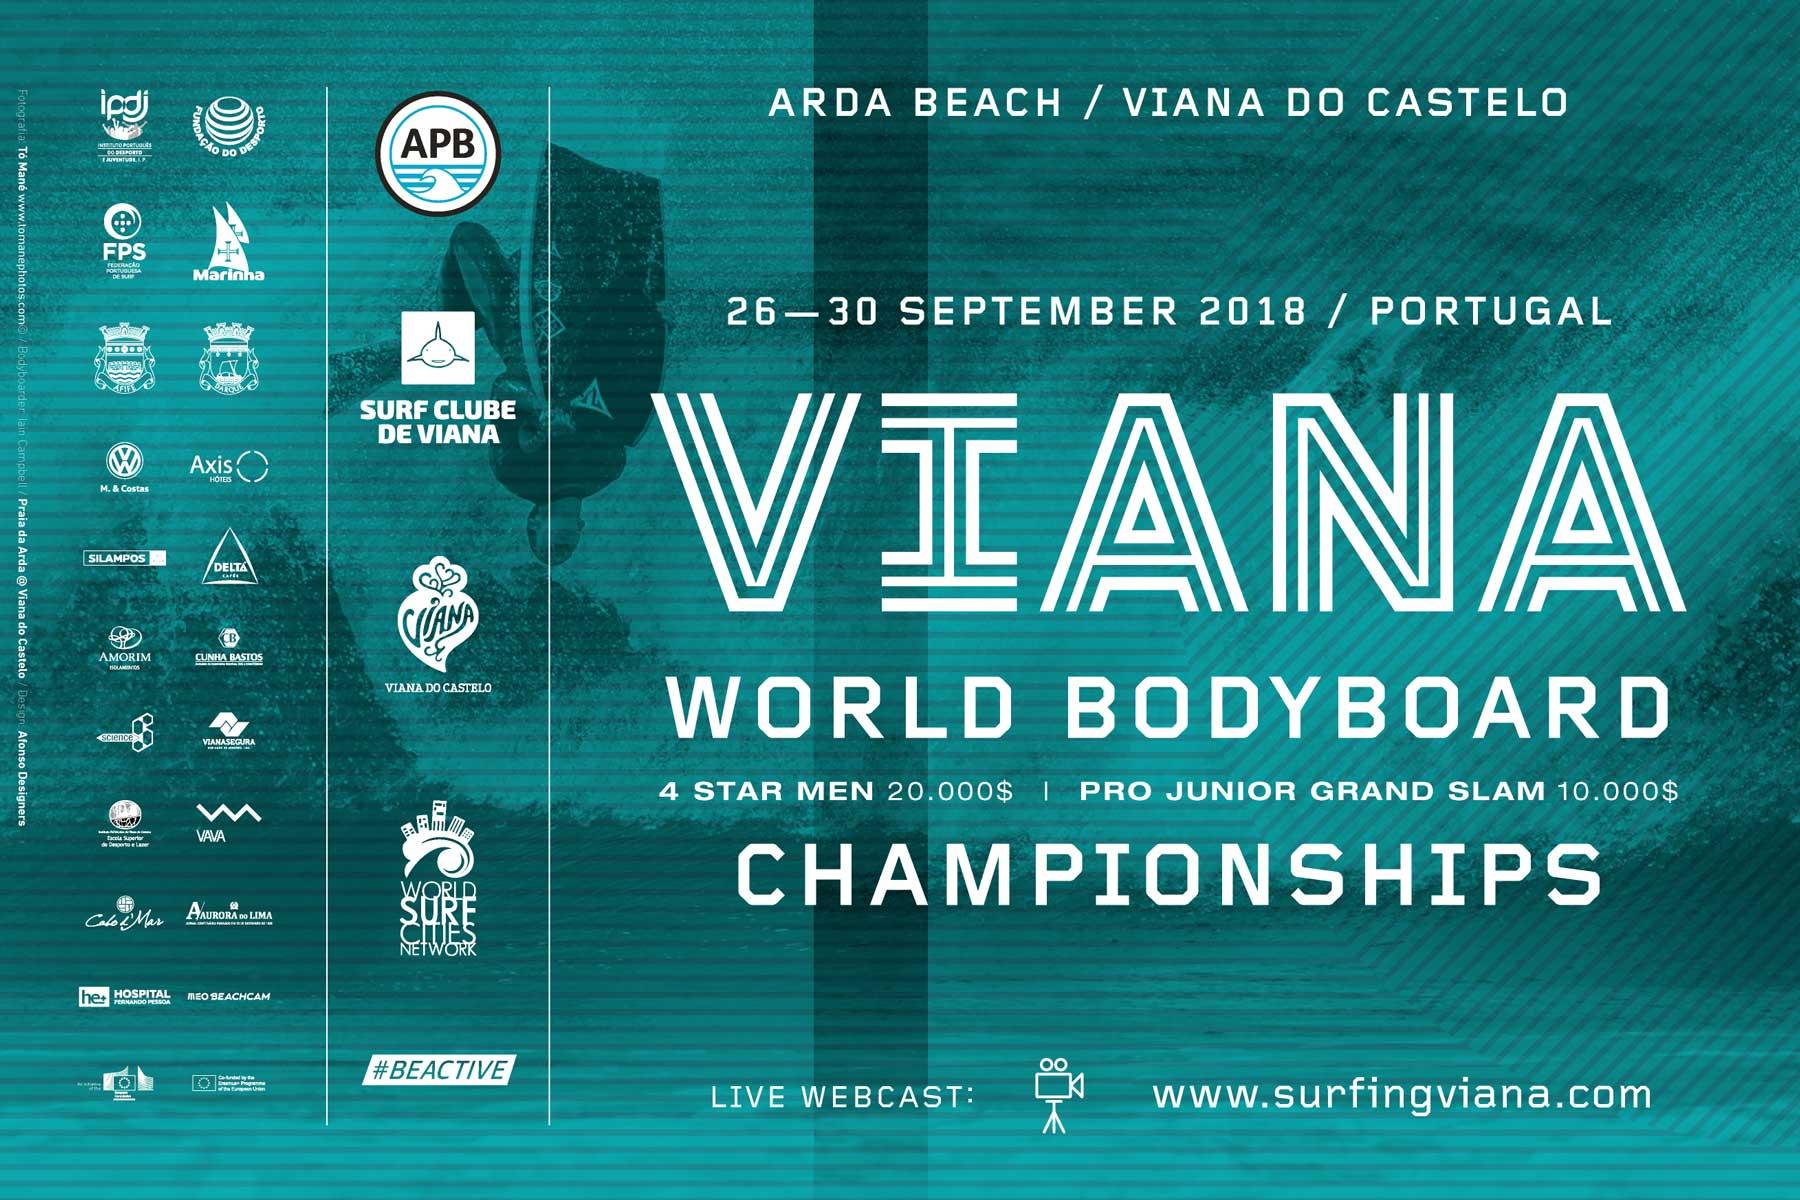 Bodyboard - Viana - Championnat du monde 2018 - HBSC